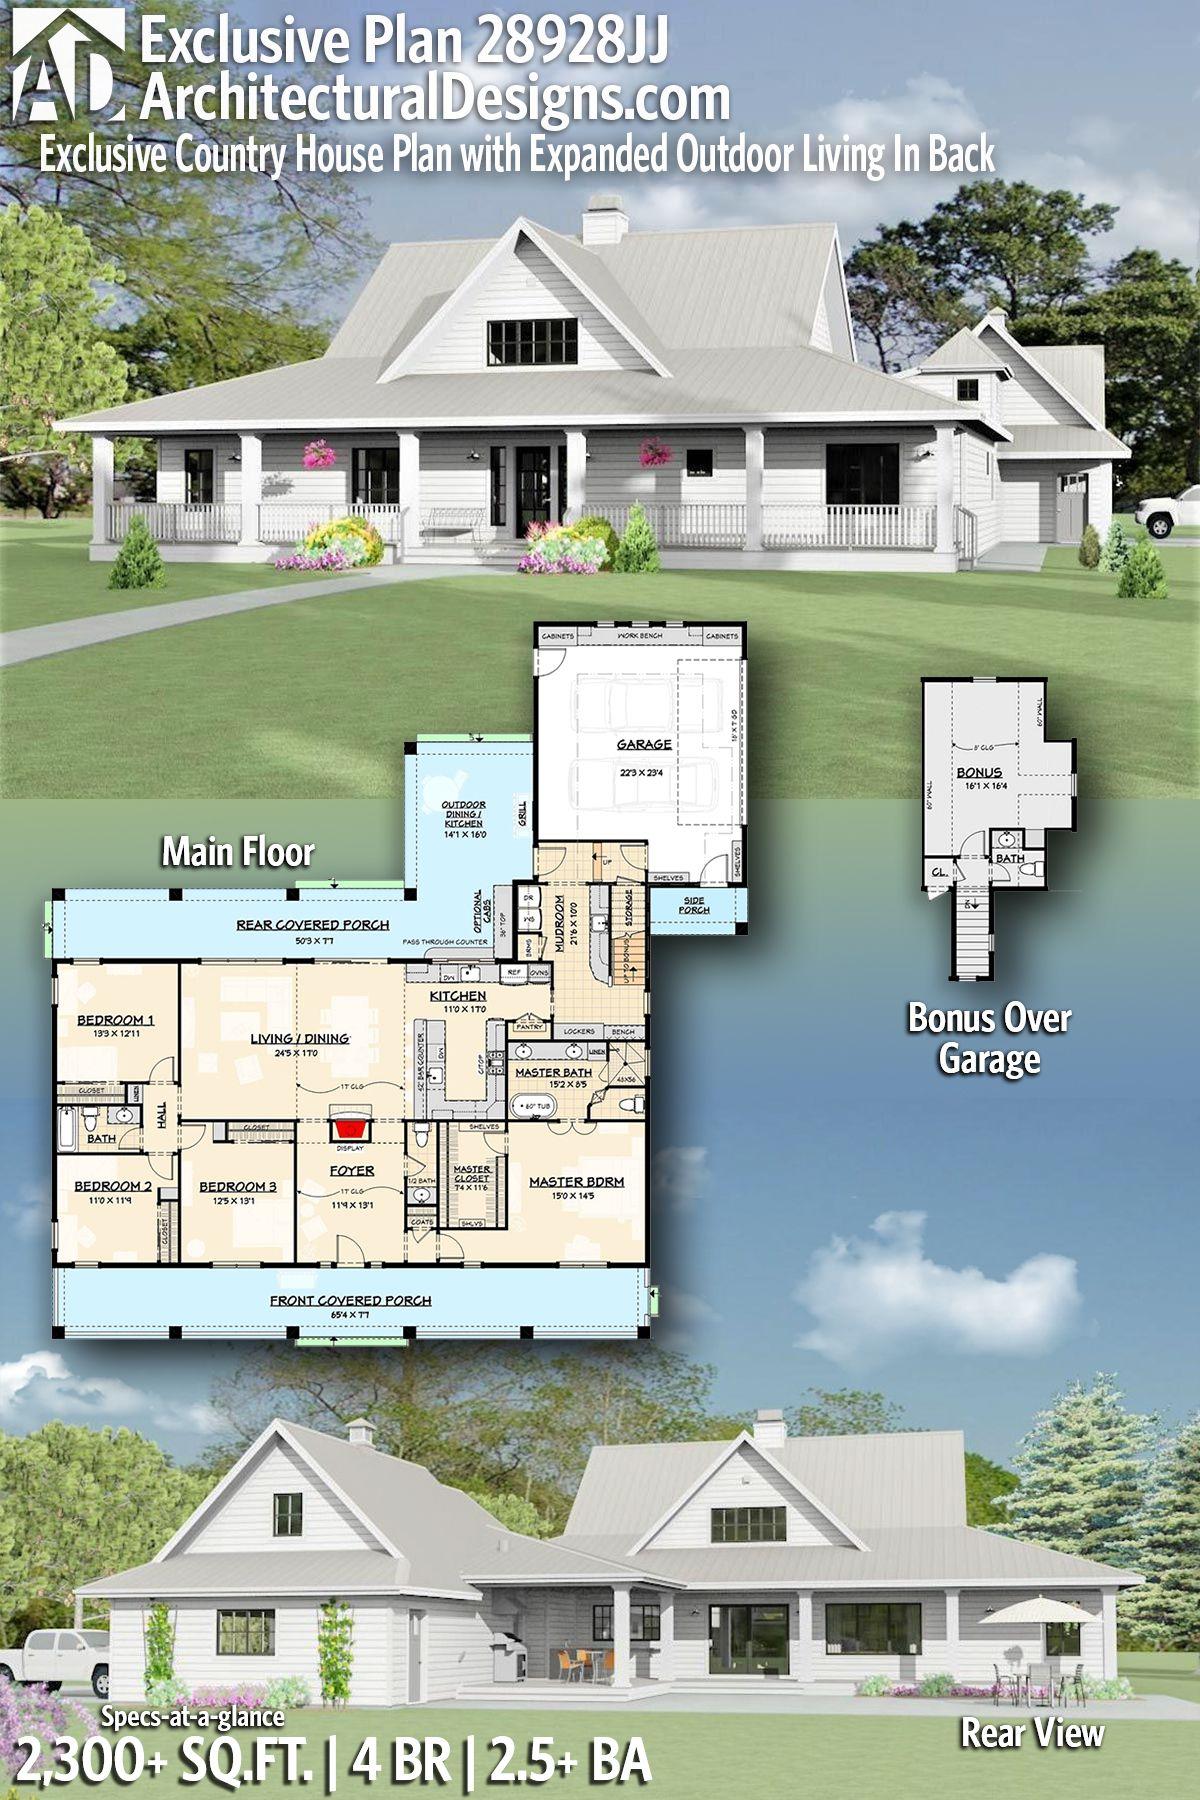 Introducing Architectural Designs Craftsman Home Plan 28928JJ